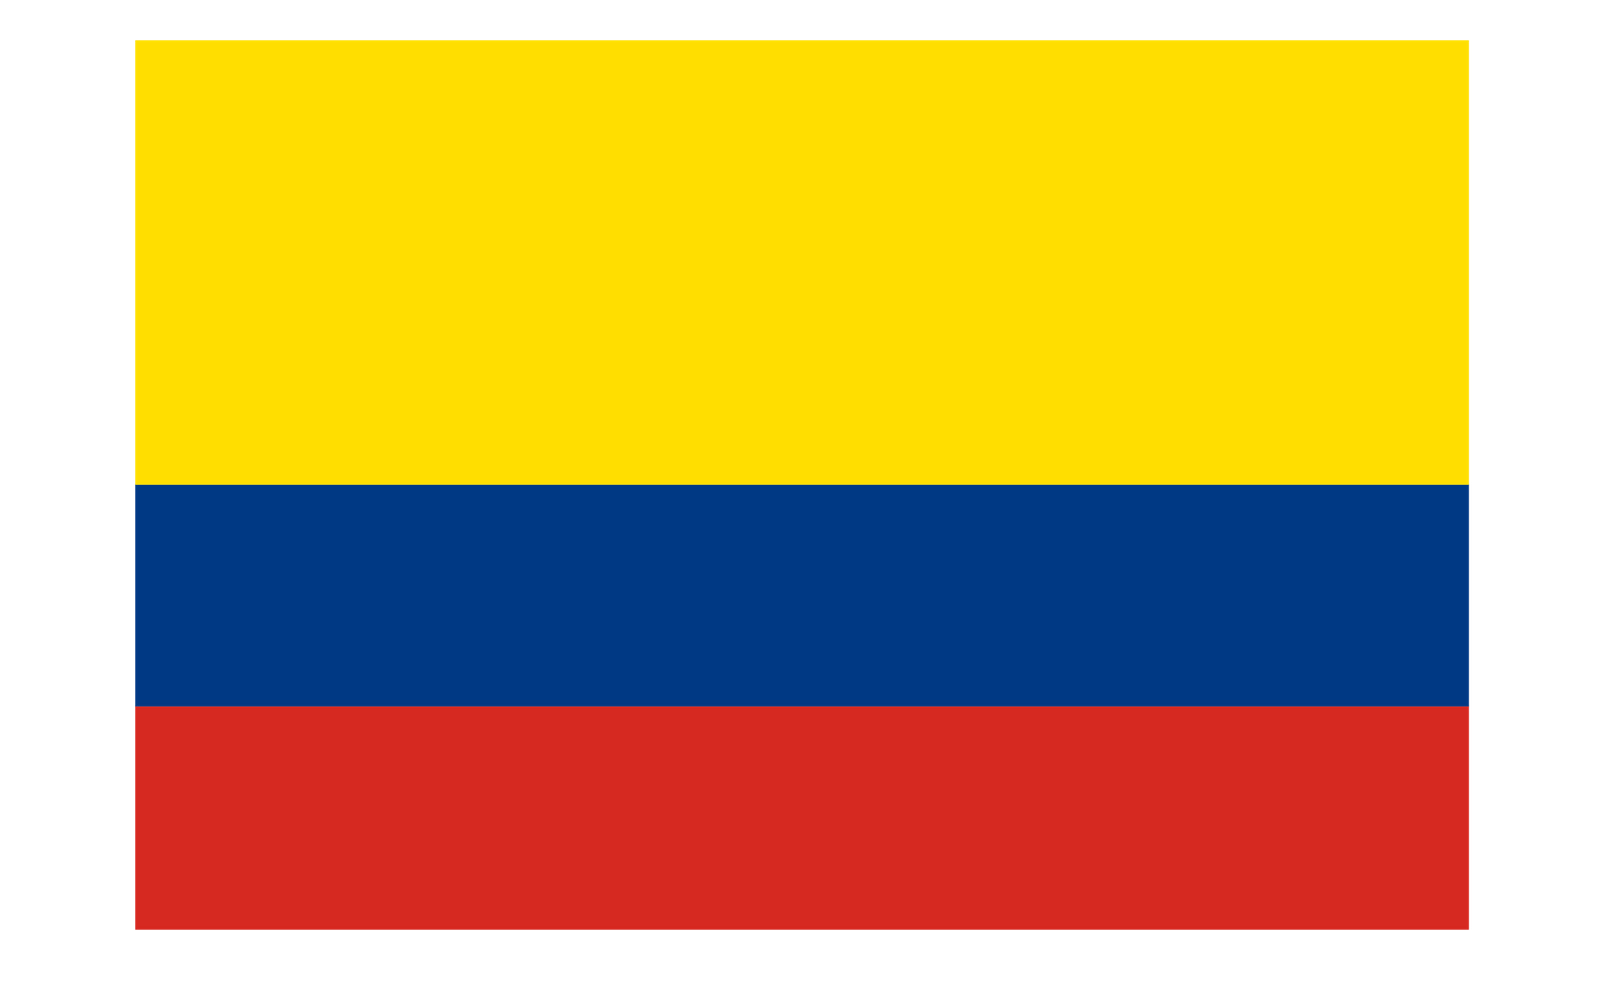 23 Colombia Flag Wallpapers On Wallpapersafari